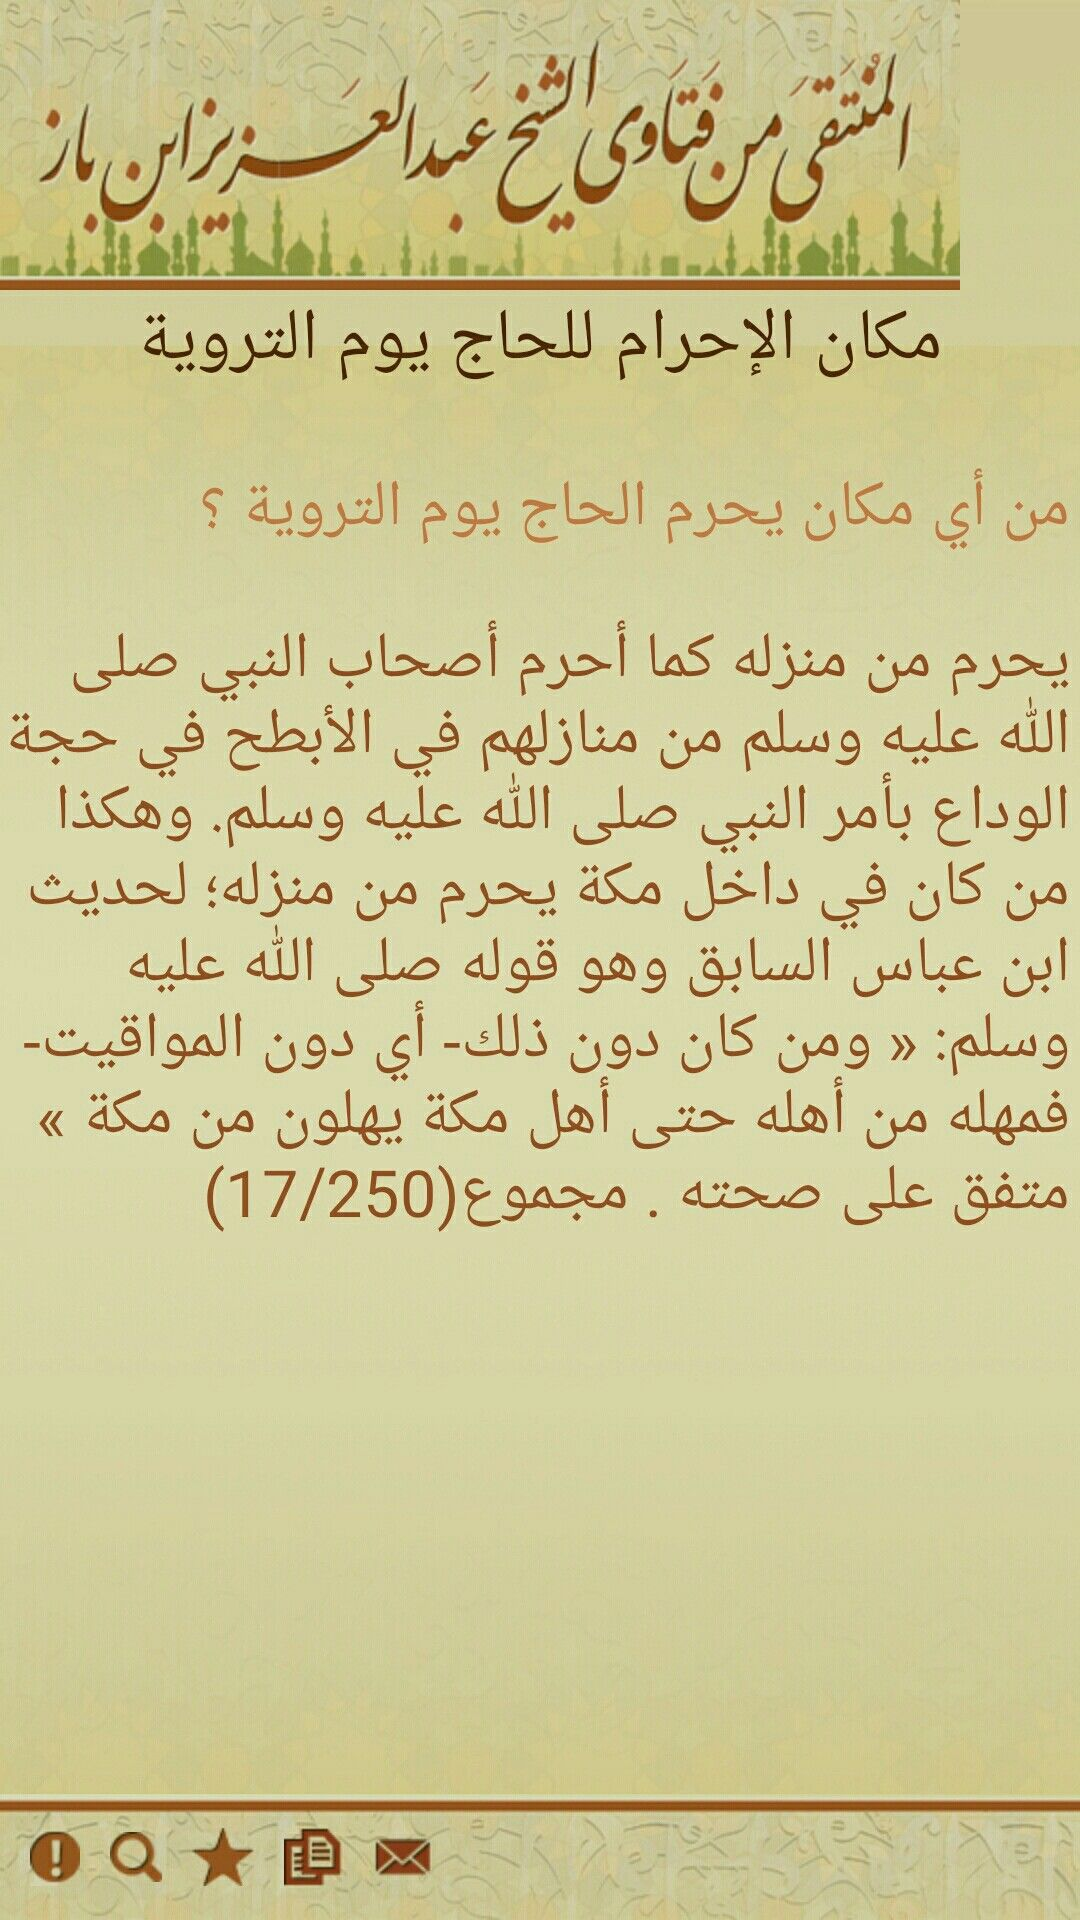 Pin By العلم الشرعي بين يديك أبوعبدال On العلم الشرعي توحيد و سنة Calligraphy Iyo Arabic Calligraphy